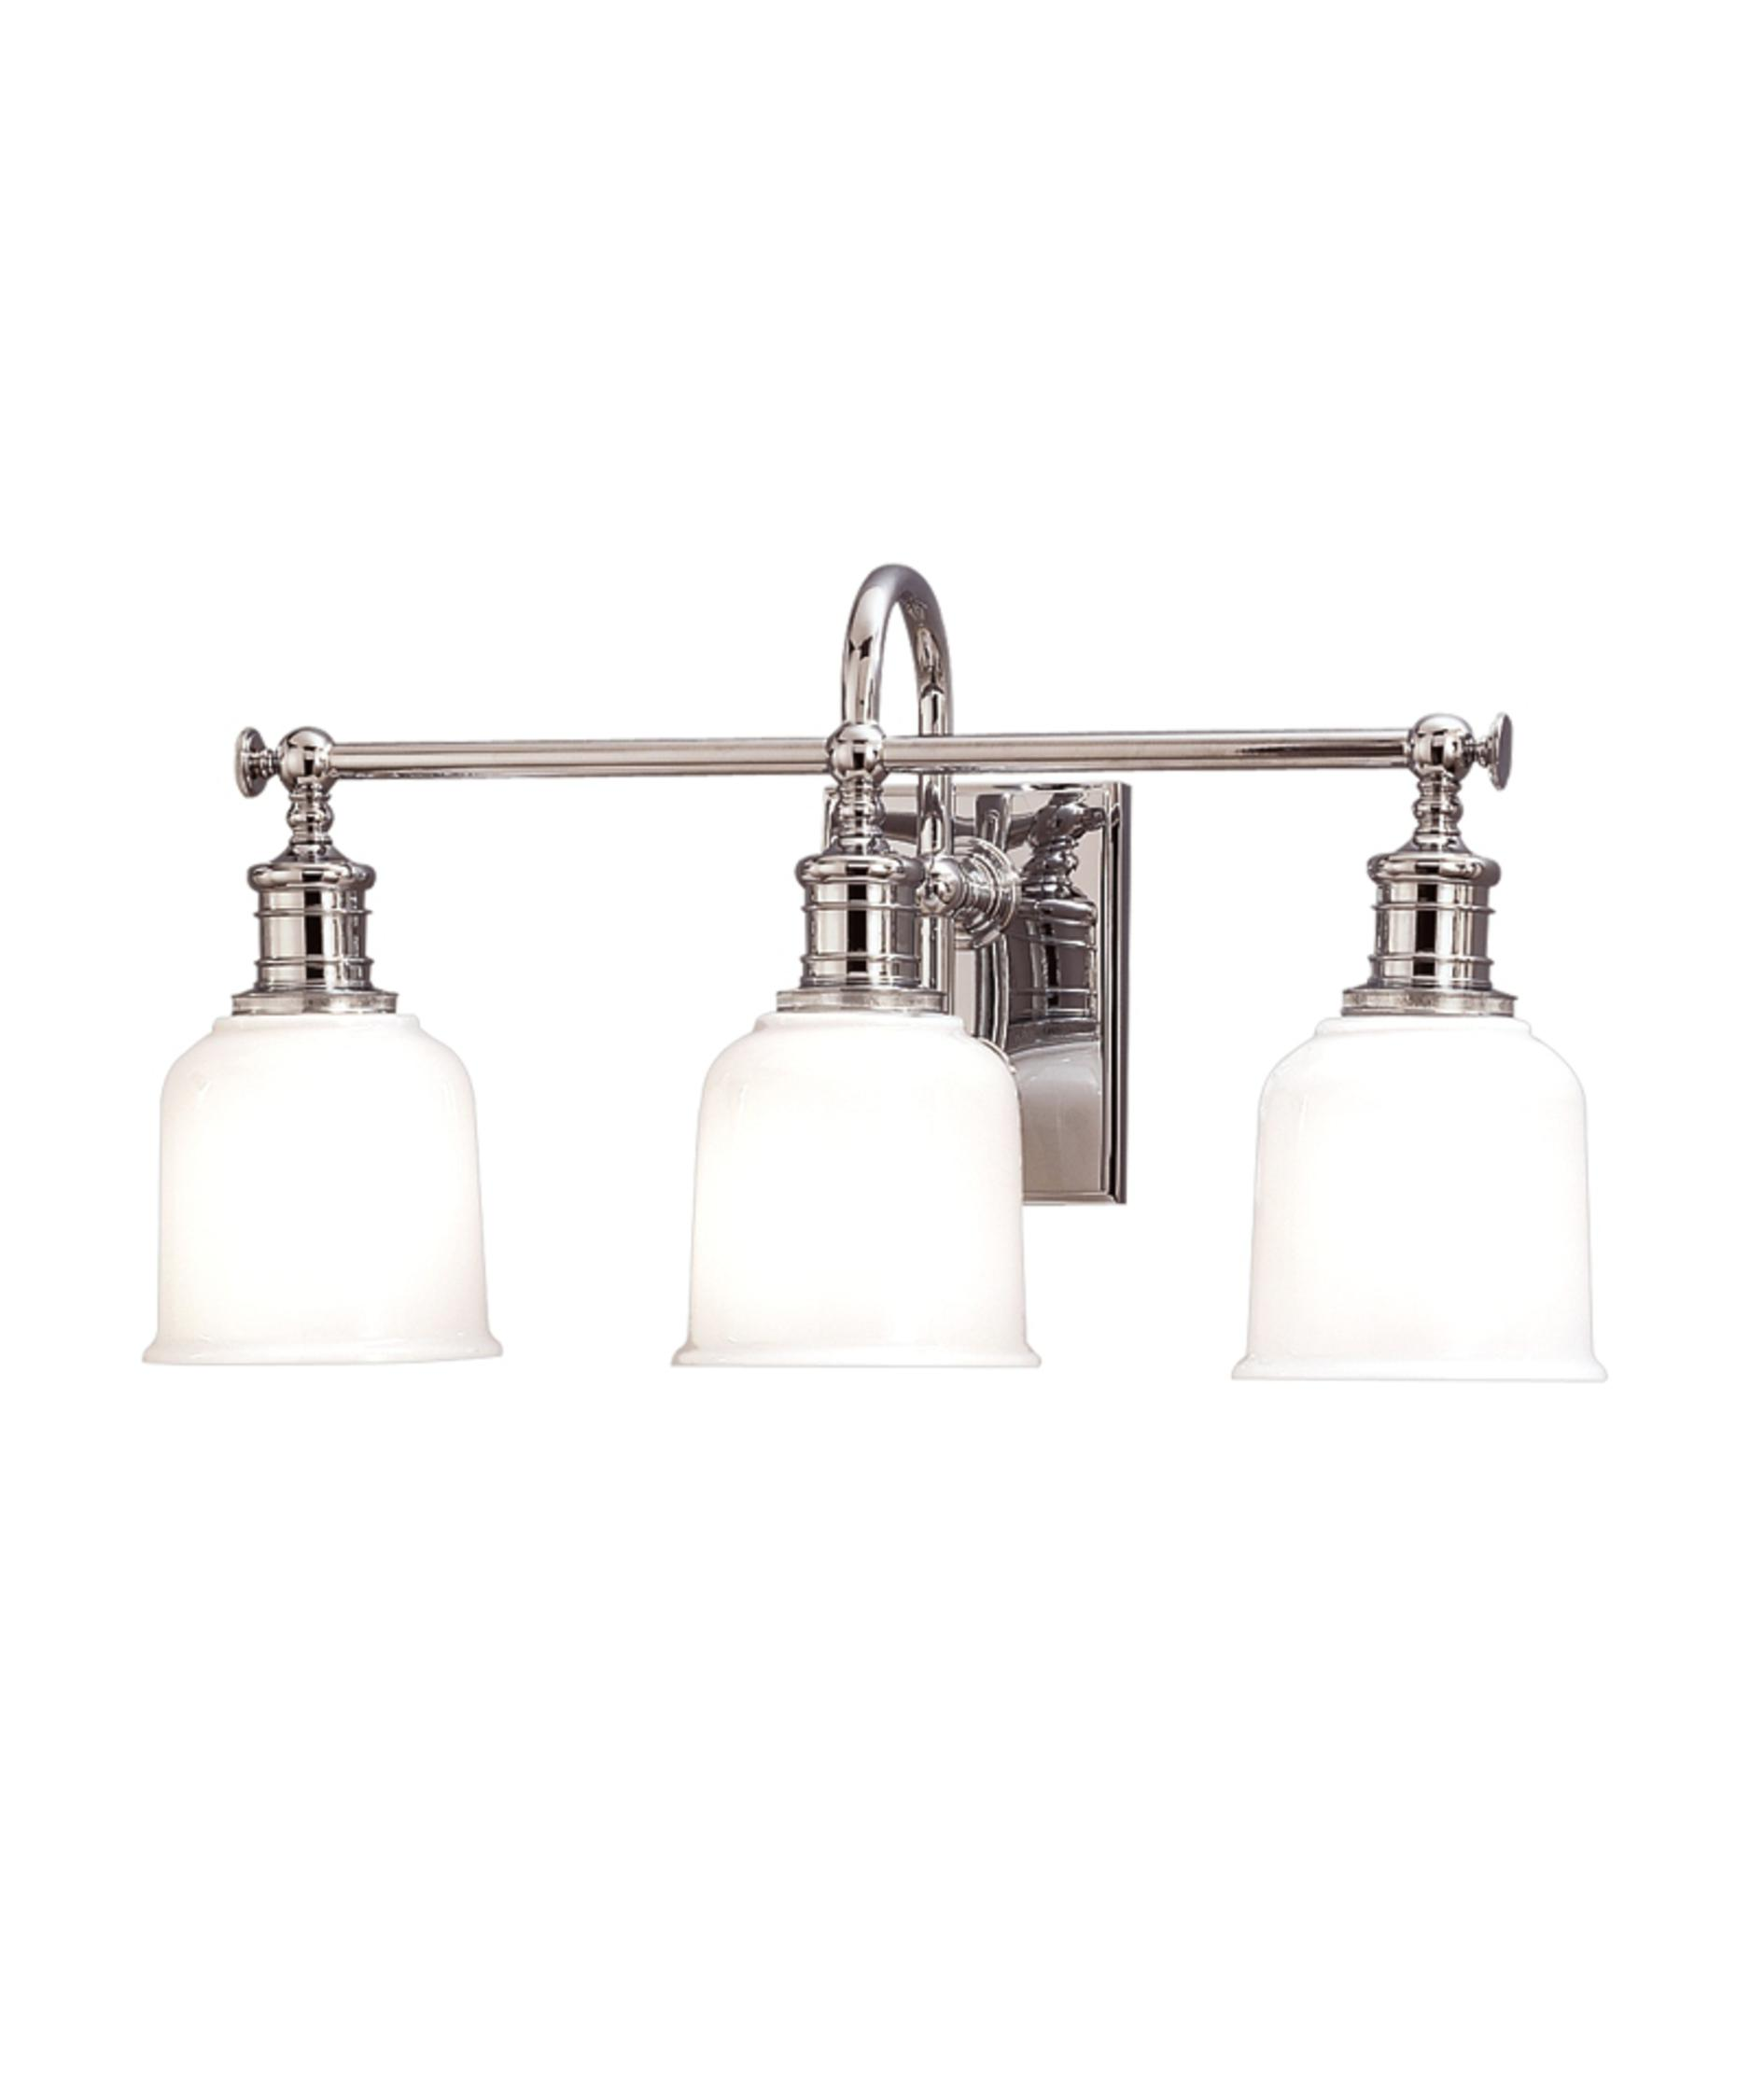 Chrome Bathroom Lighting Fixtures Bathroom – Chrome Bathroom Lighting